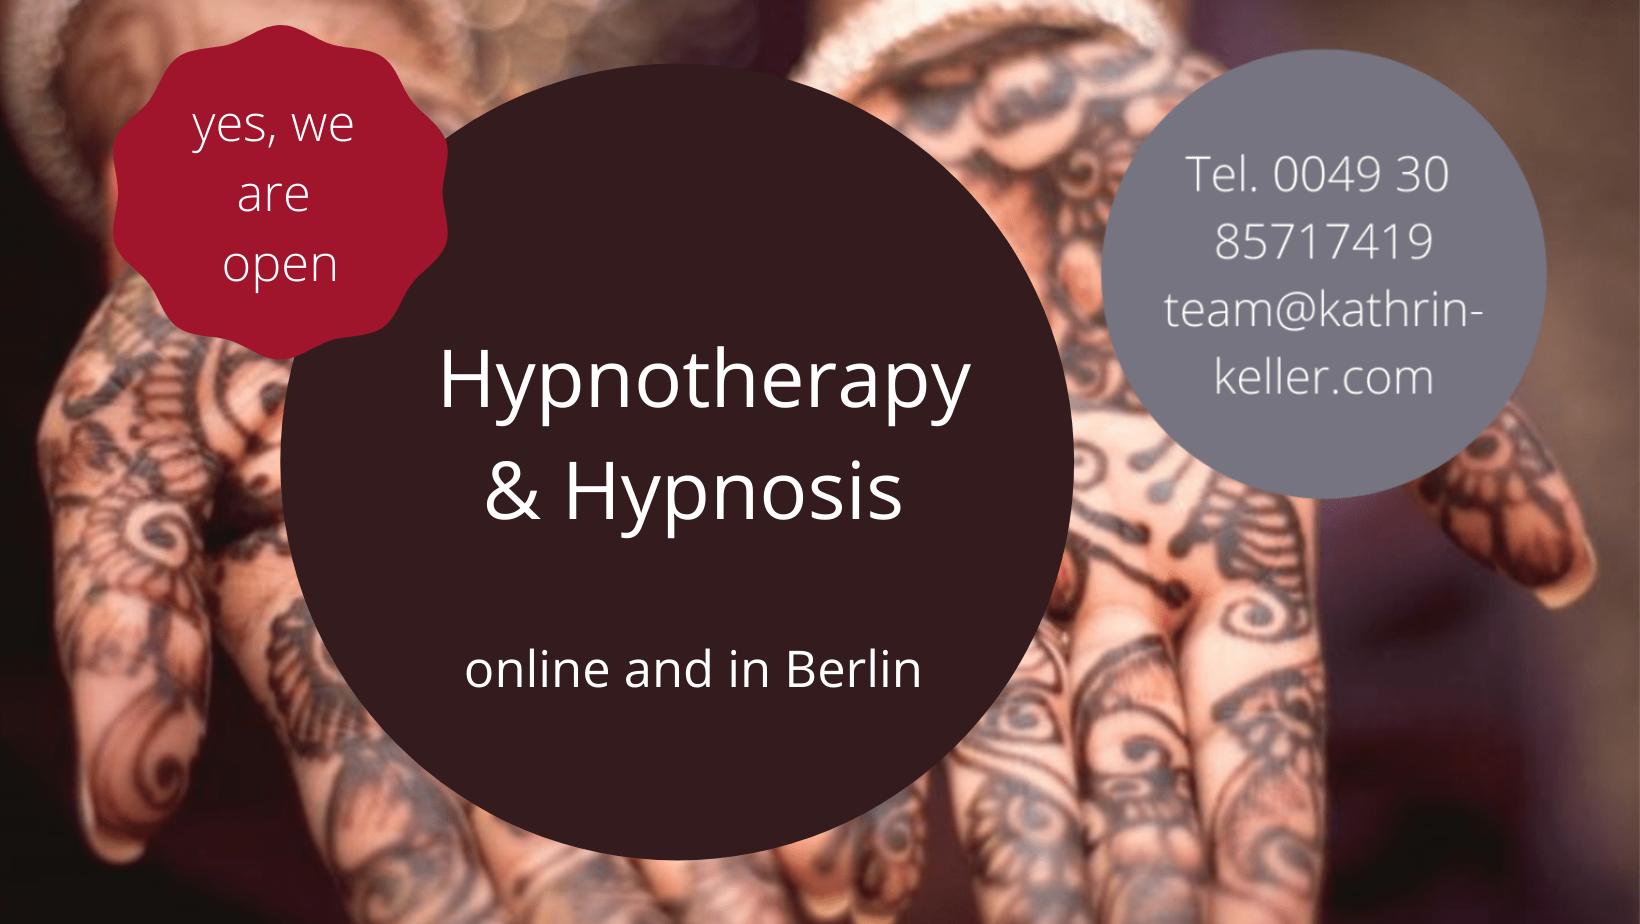 hypnosis hypnotherapy berlin